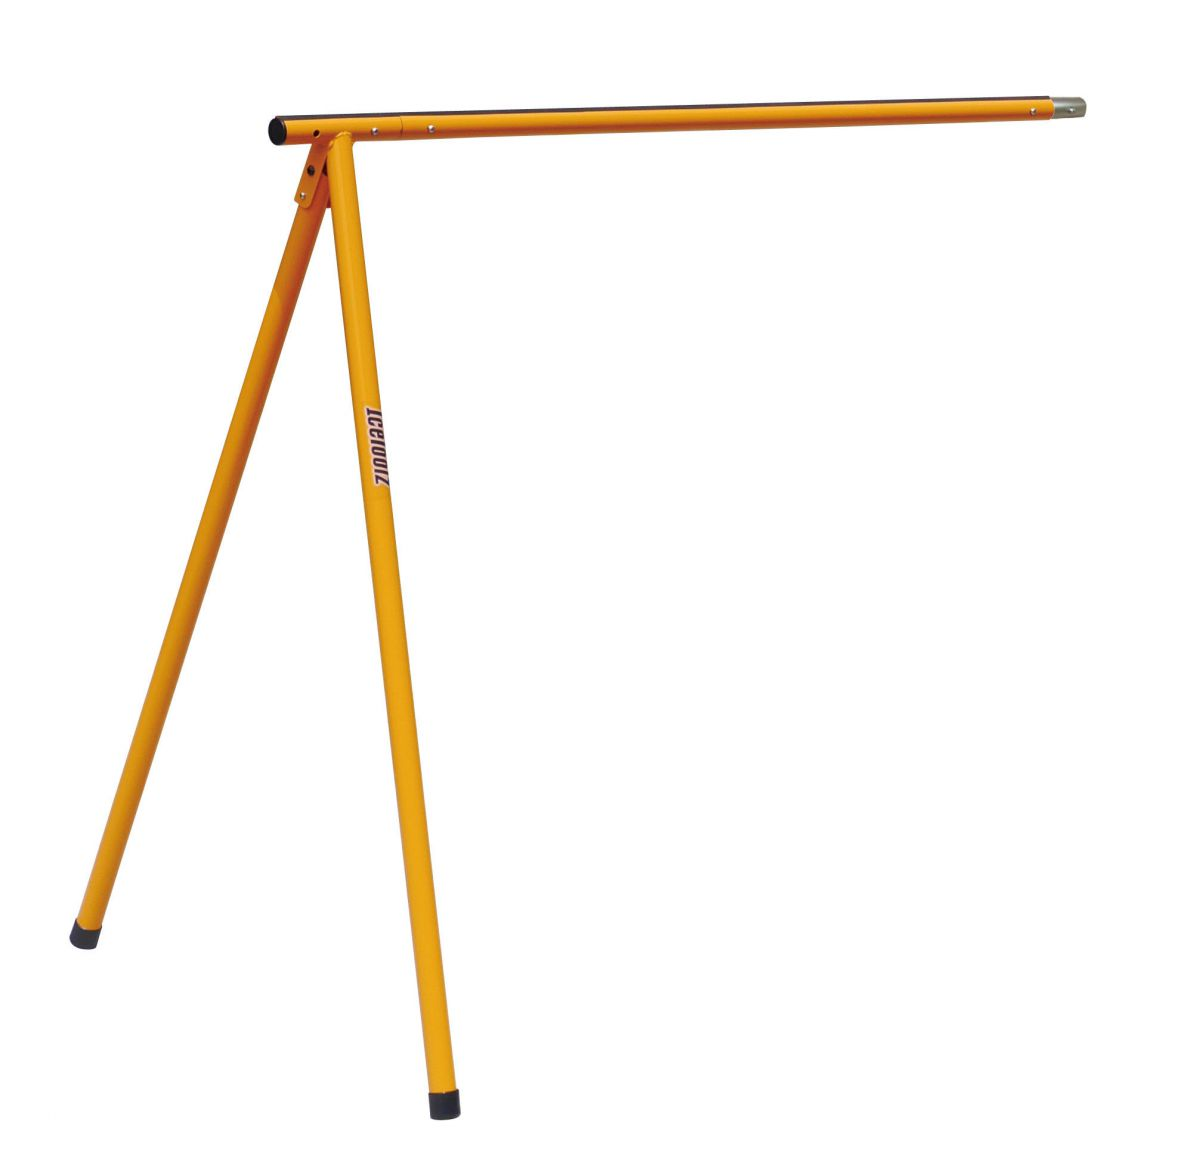 icetoolz display stand extension kit p411s 46 bicycles orange